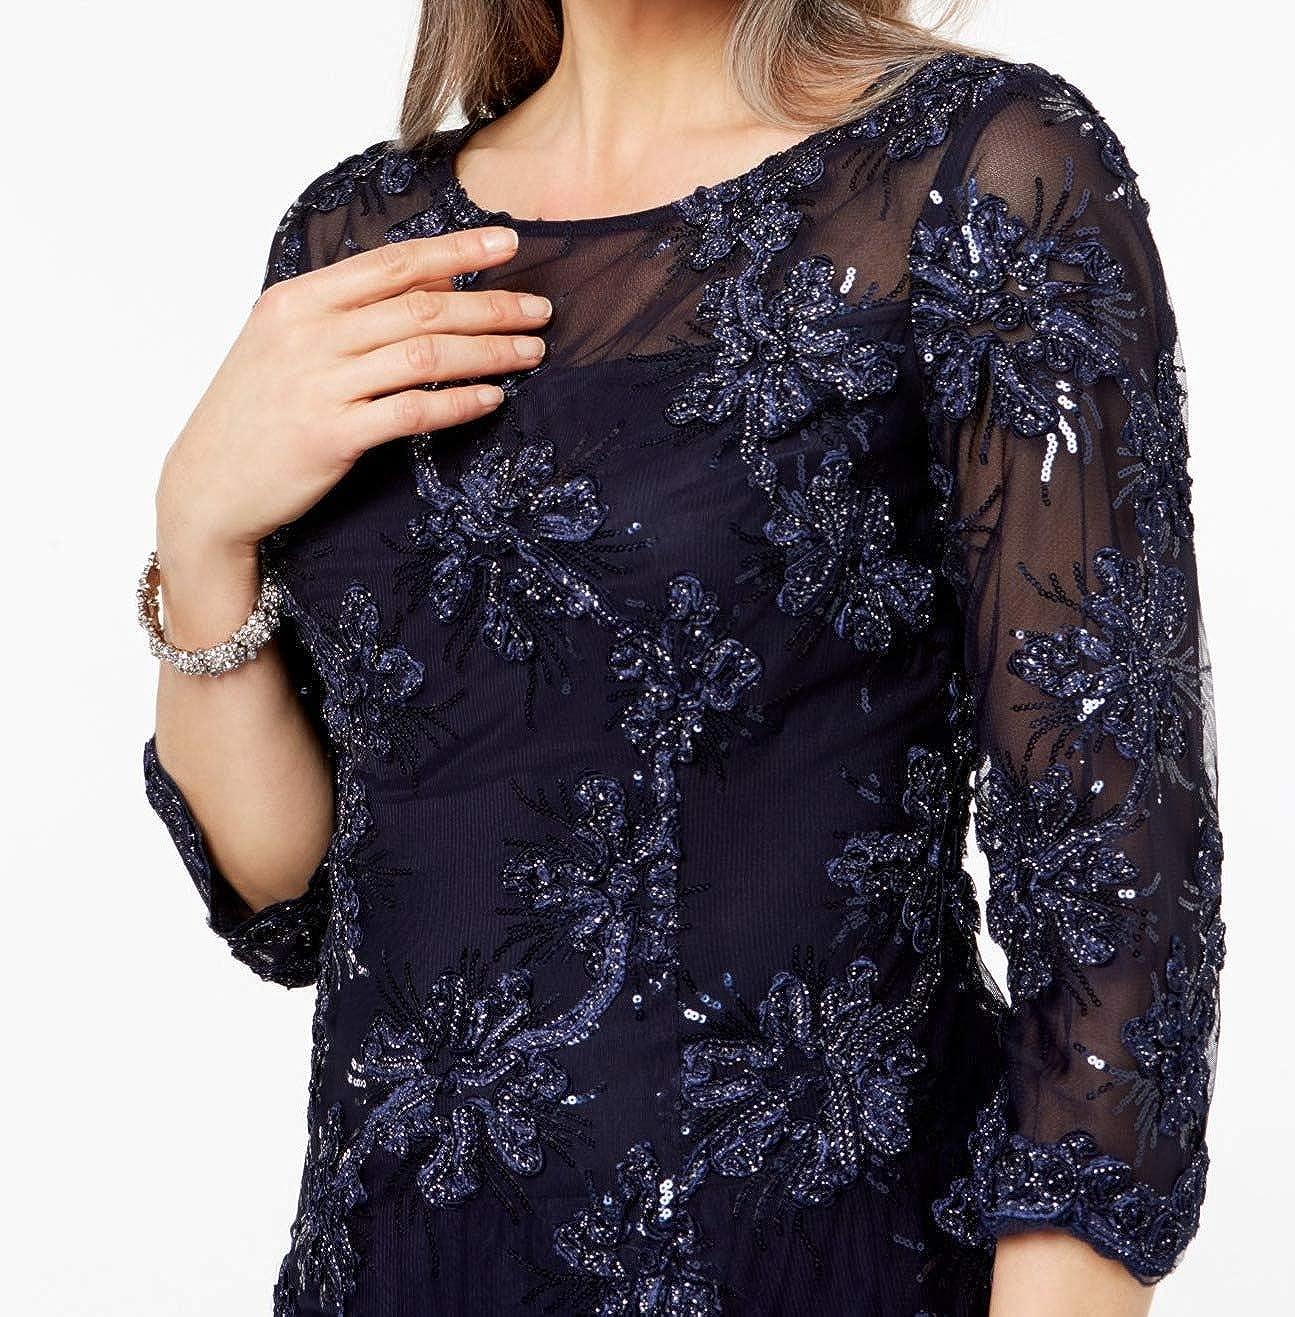 105728ba02e Alex Evenings Navy mesh Sequin Women s A-Line Dress Blue 6 at Amazon  Women s Clothing store